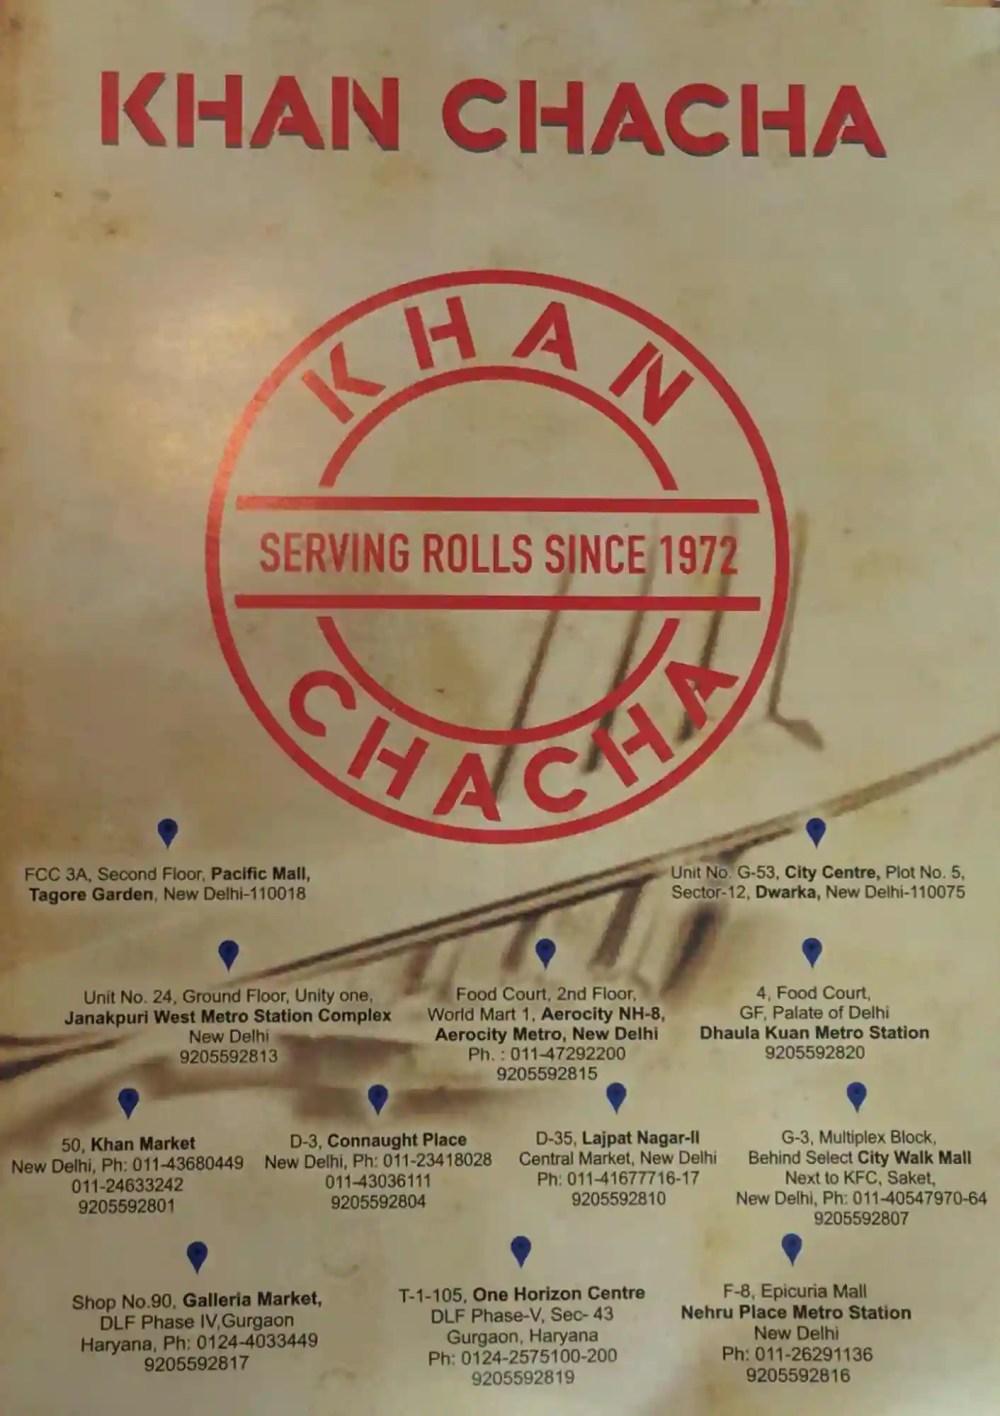 medium resolution of  khan chacha photos dwarka sector 12 delhi home delivery restaurants